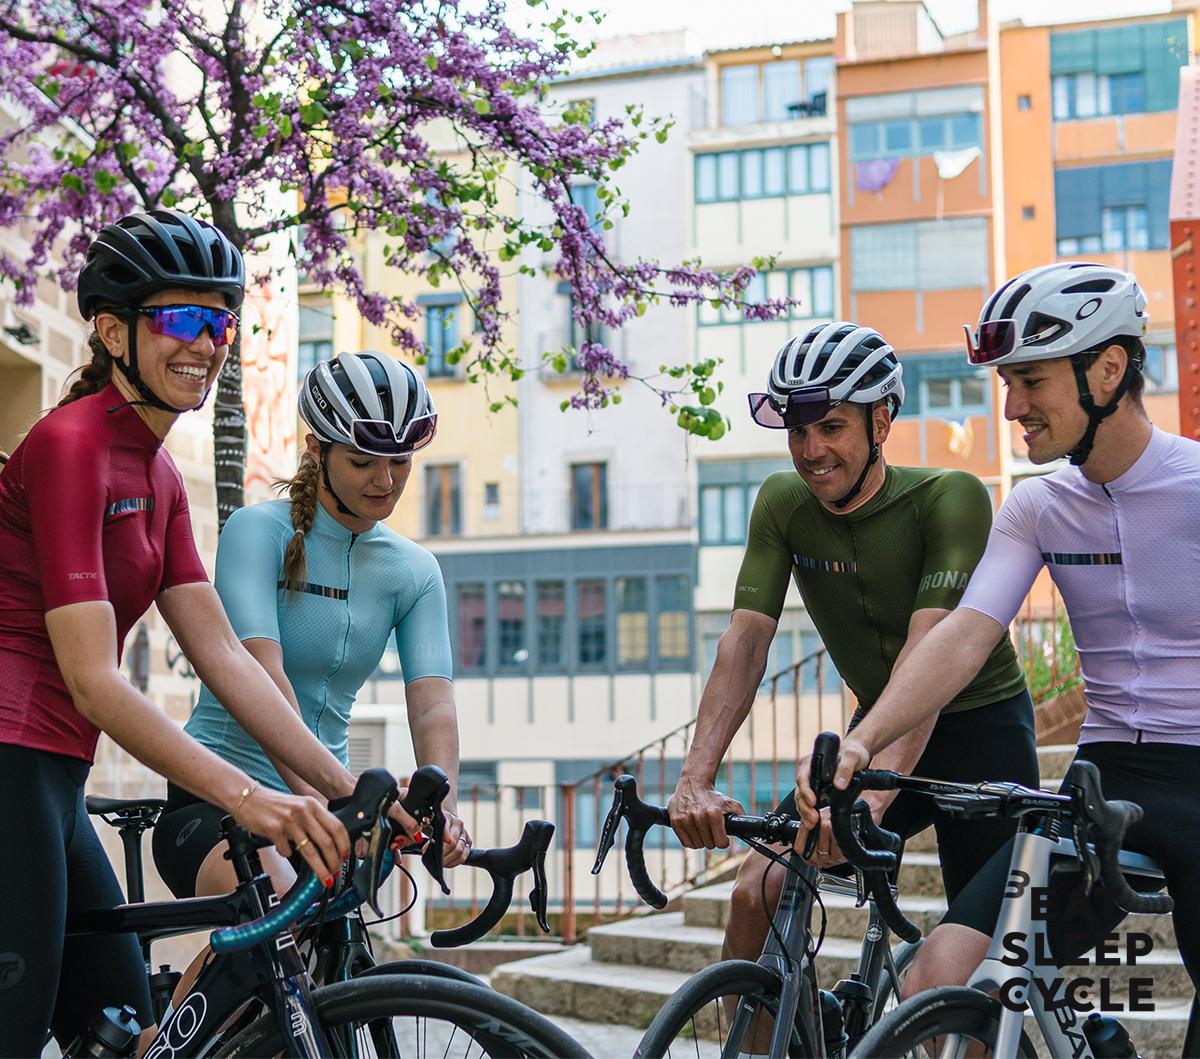 Eat-Sleep-Cycle-Hub-Cafe-Cycling-Cafe-Girona-Cycling